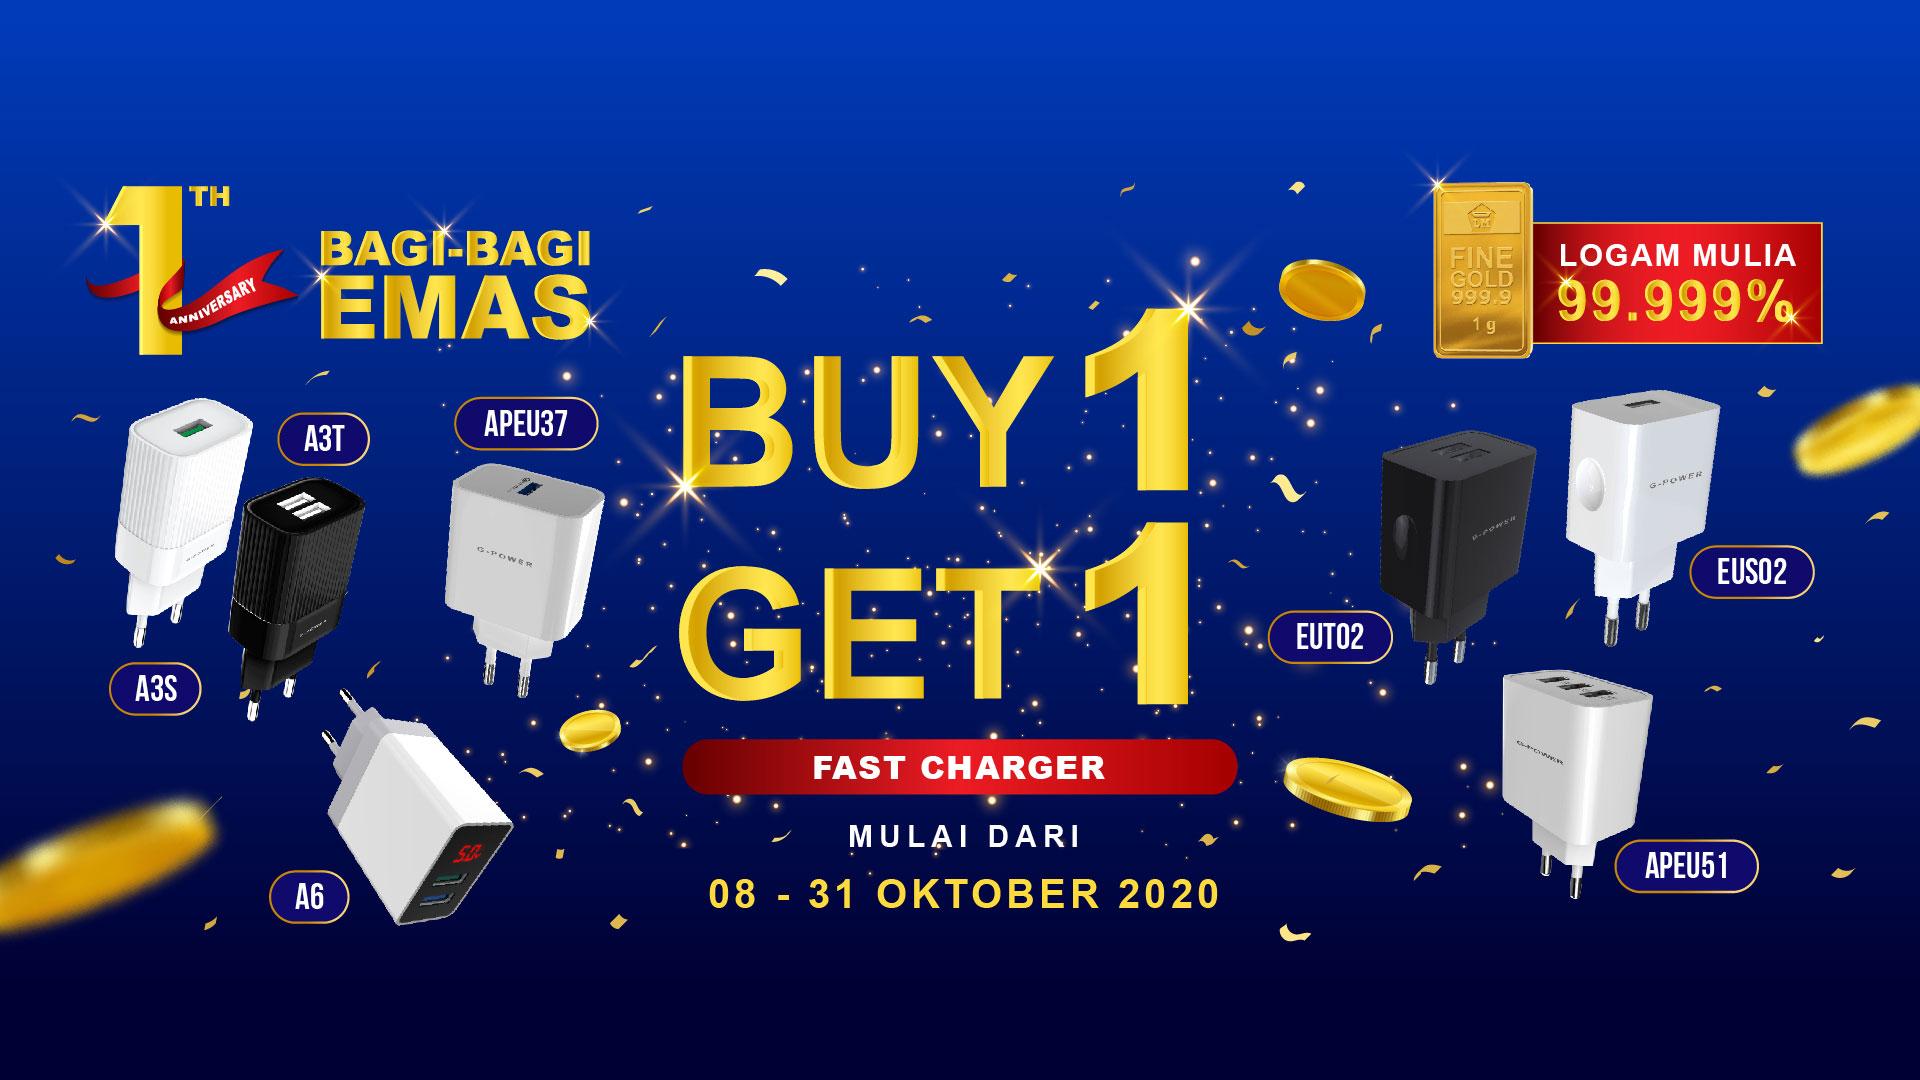 E03M03P09-20201010-G-Power-Promo-1st-Anniversary-Bagi-Emas-Buy-1-get-1-Fast-Charger-Homepage.jpg